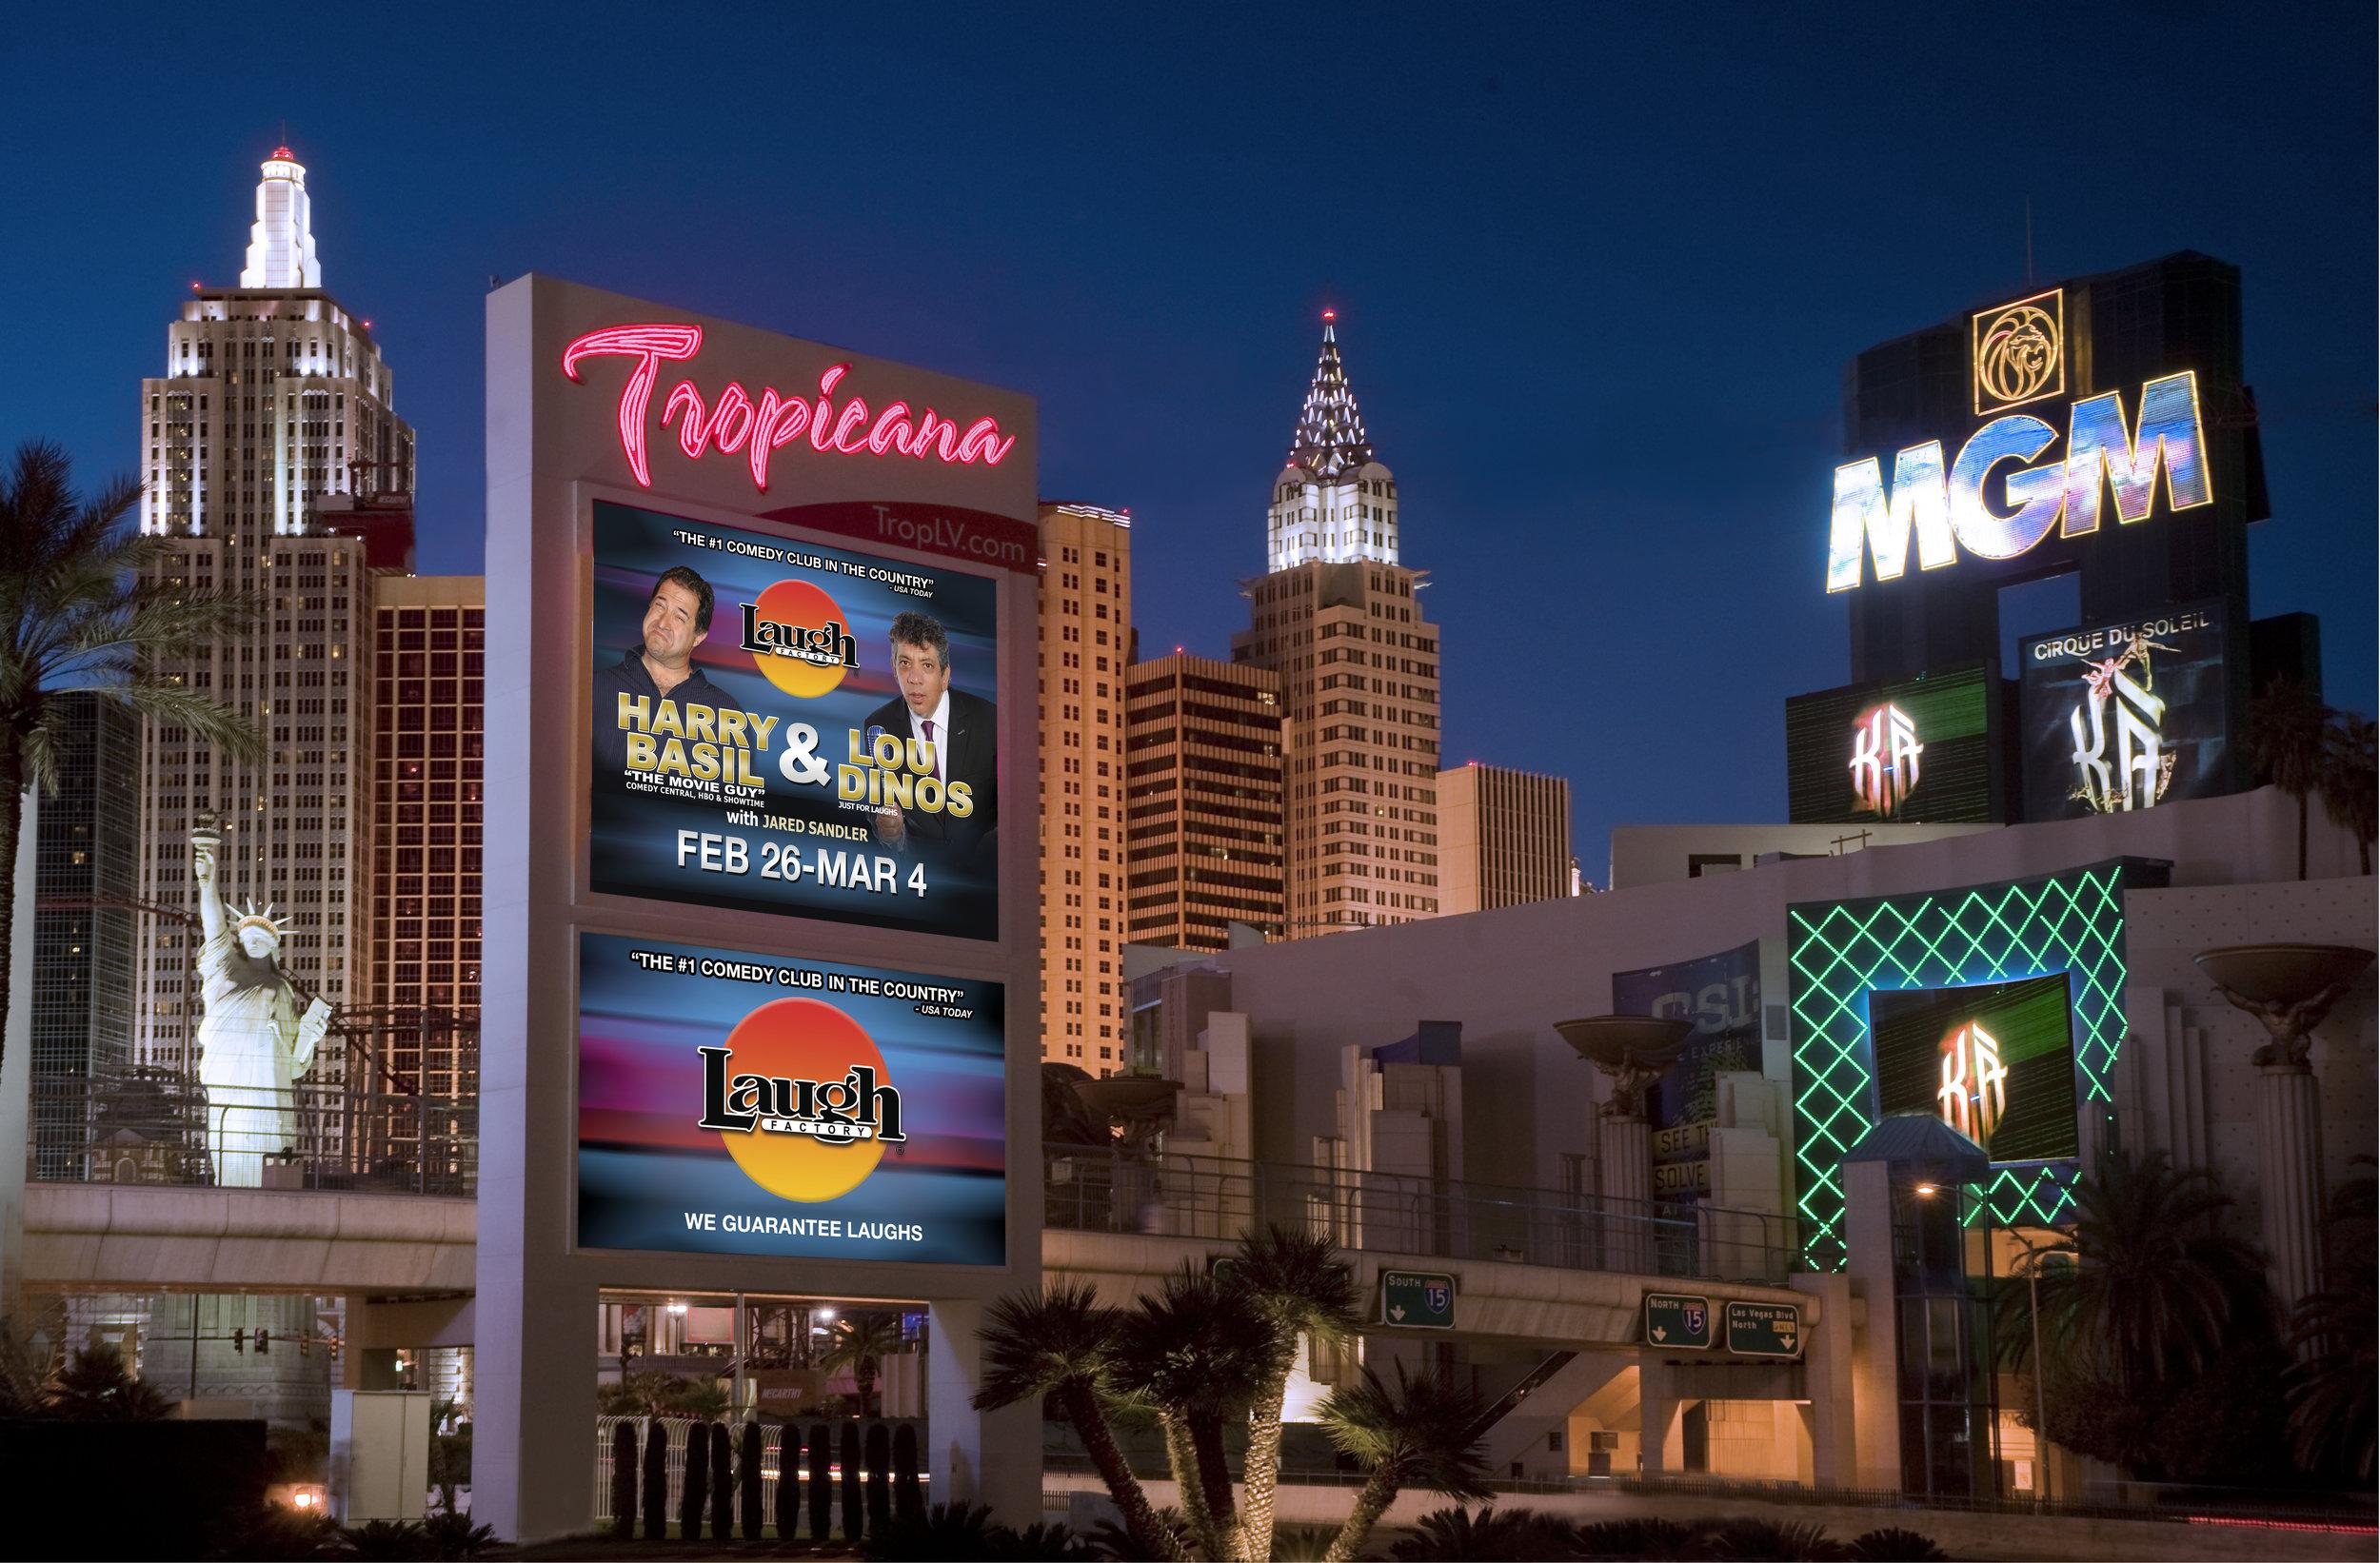 Laugh Factory-Harry Basil & Lou Dinos- Feb 26-Mar 4-Vegas Marquee-shot-1-low res(1).jpg